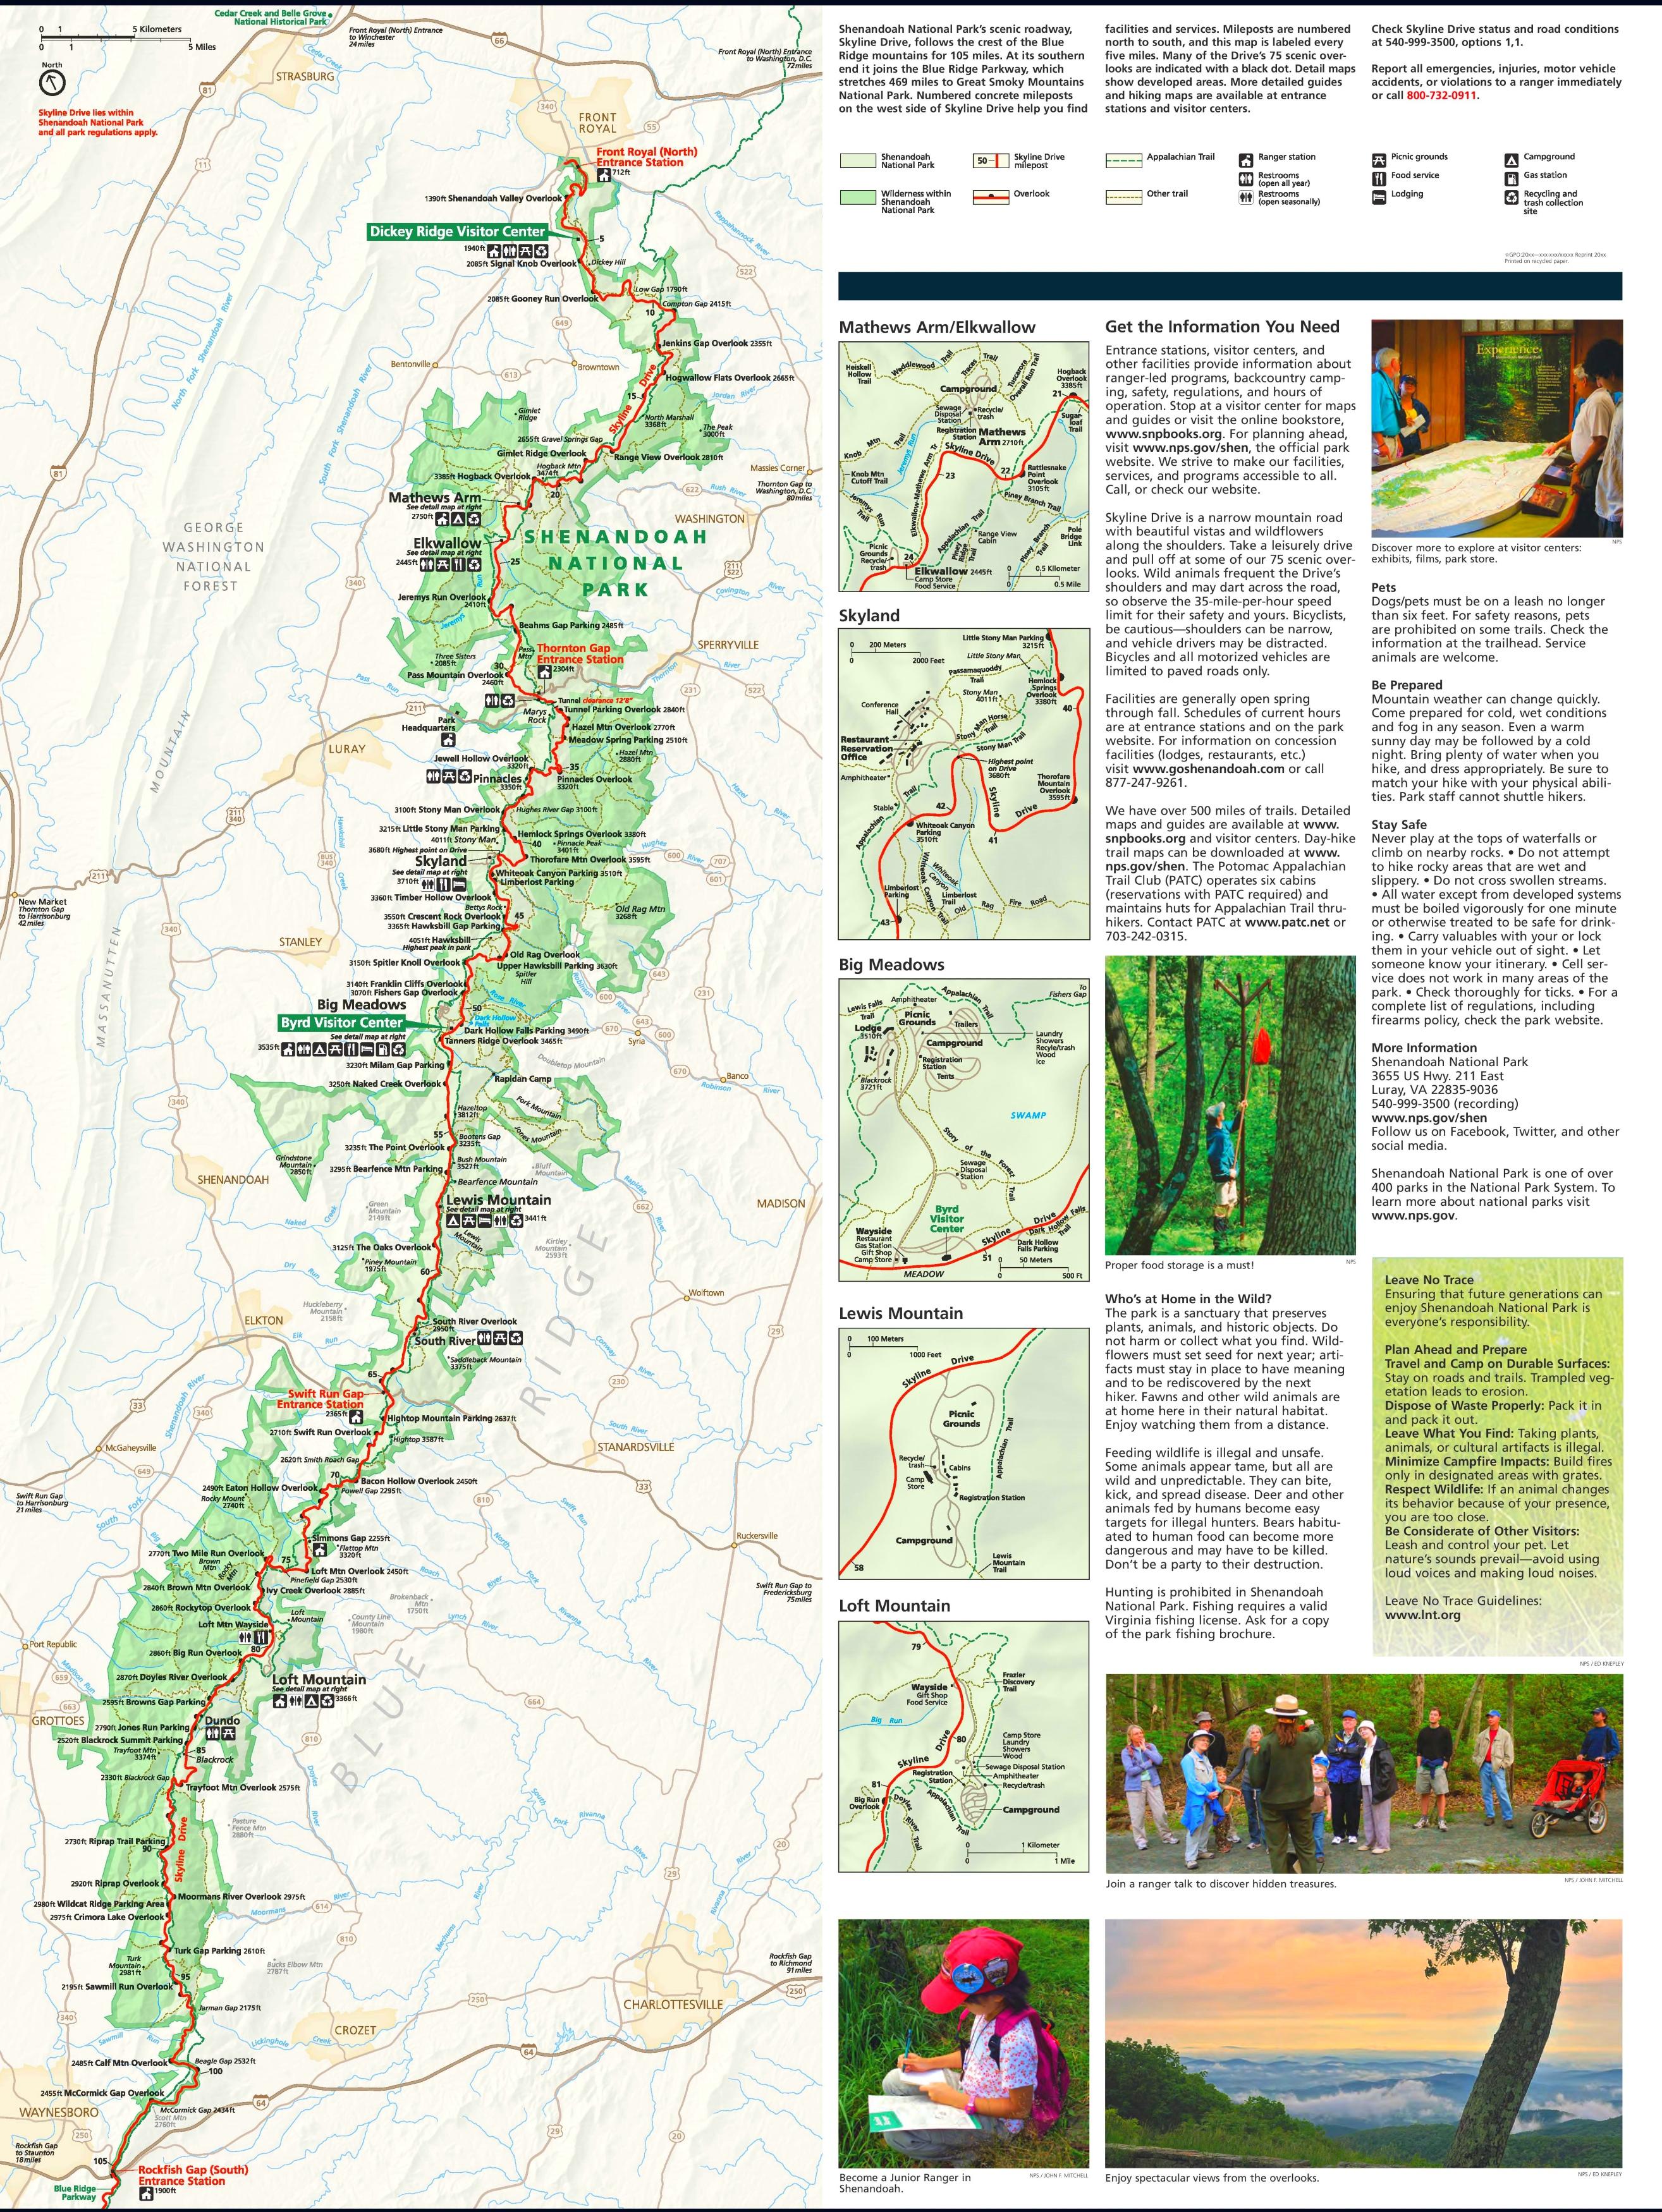 Map Of Shenandoah National Park Shenandoah National Park trail map Map Of Shenandoah National Park